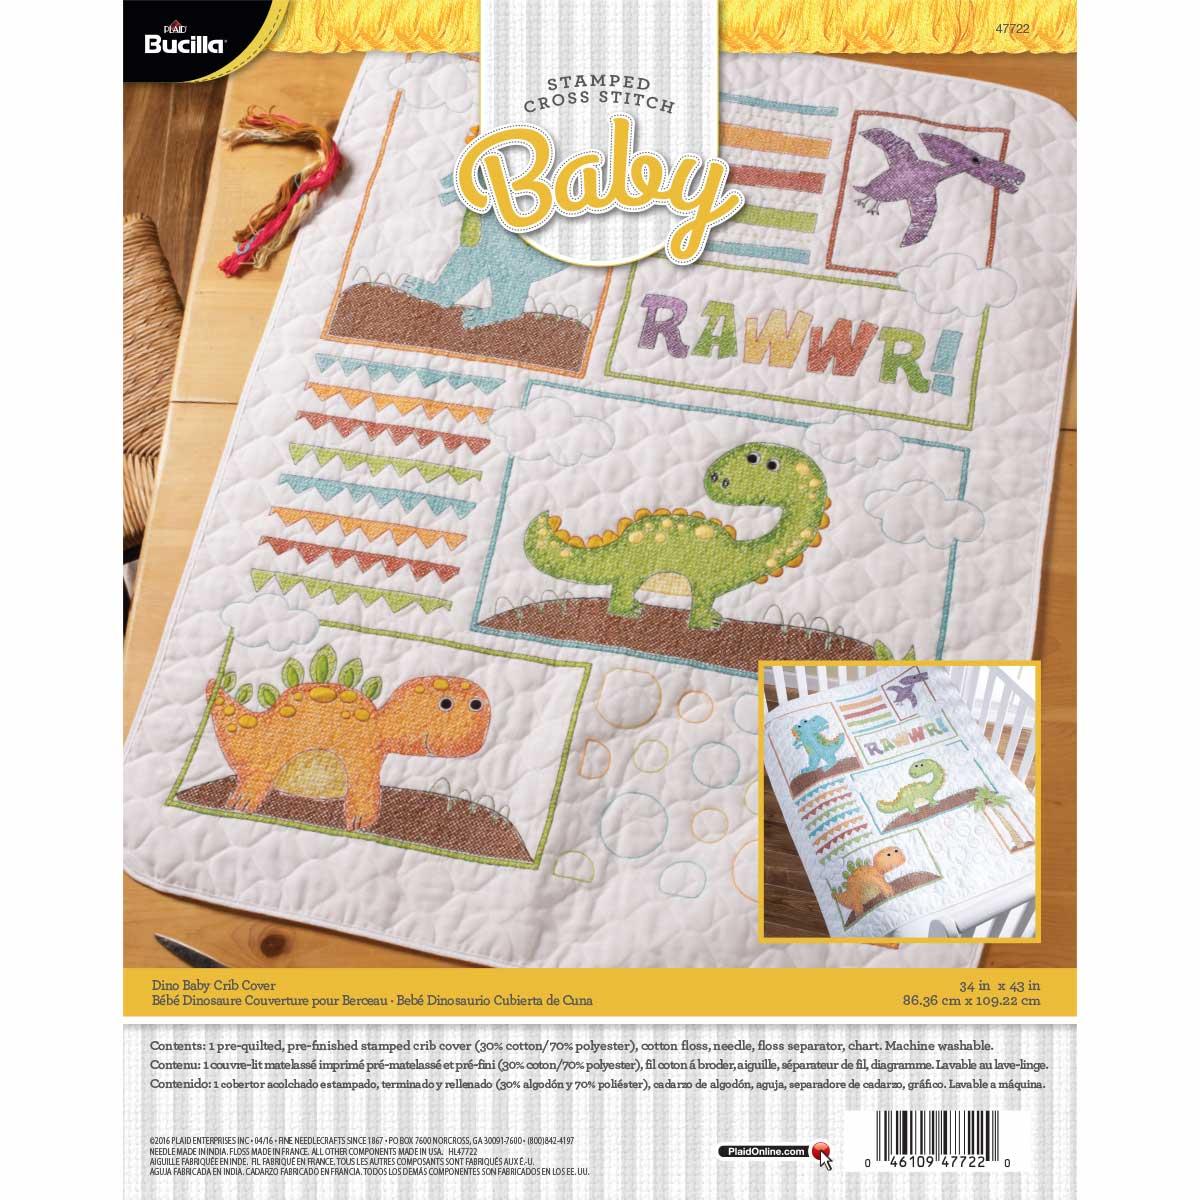 Bucilla ® Baby - Stamped Cross Stitch - Crib Ensembles - Dino Baby - Crib Cover